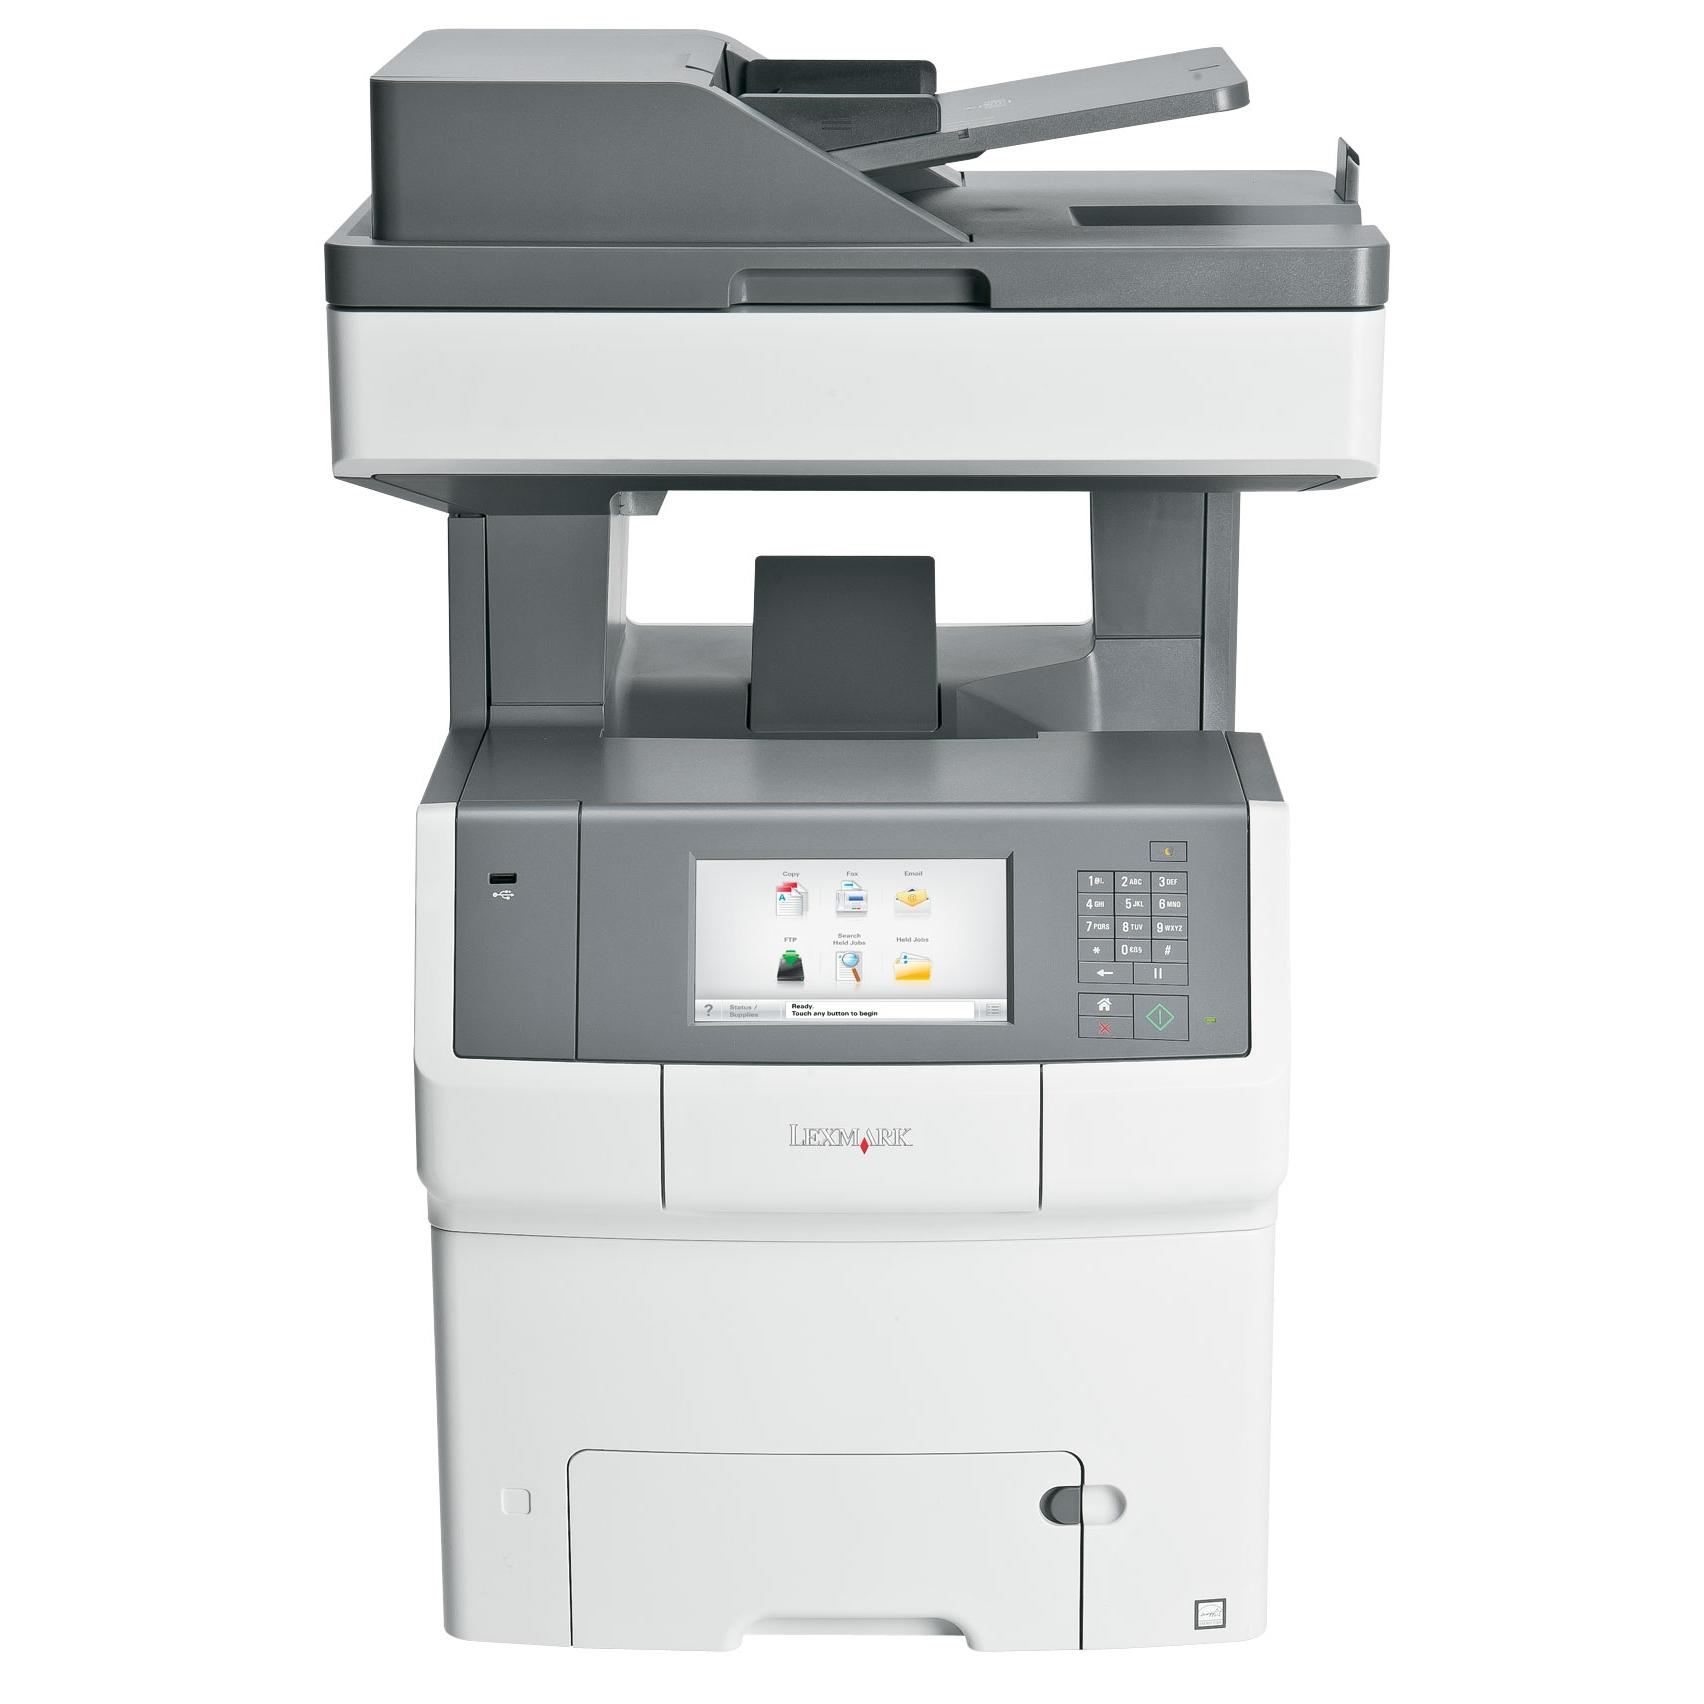 Lexmark X748DE All-In-One Color fax, Copier, Scanner Eco-friendly Laser Printer (Manufacturer Refurbished) by Lexmark